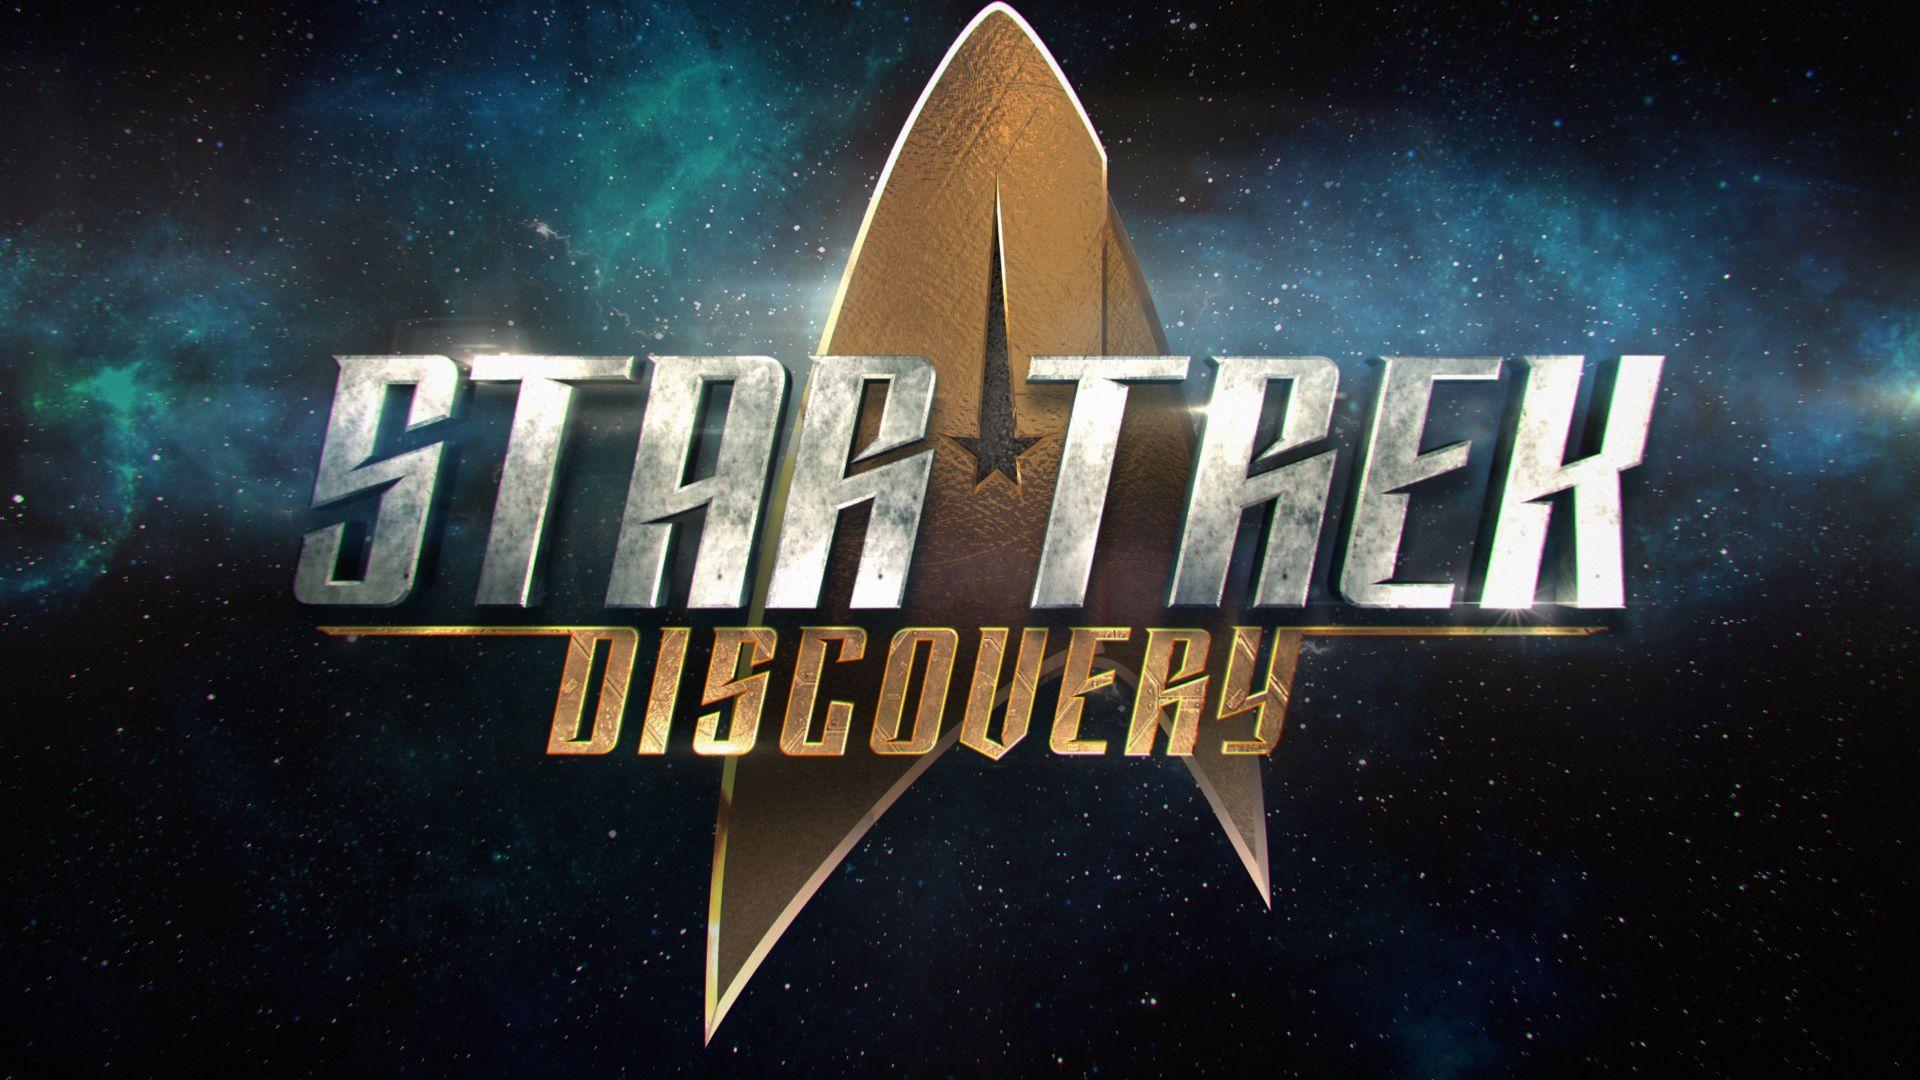 Download Star Trek Discovery Wallpaper  Background